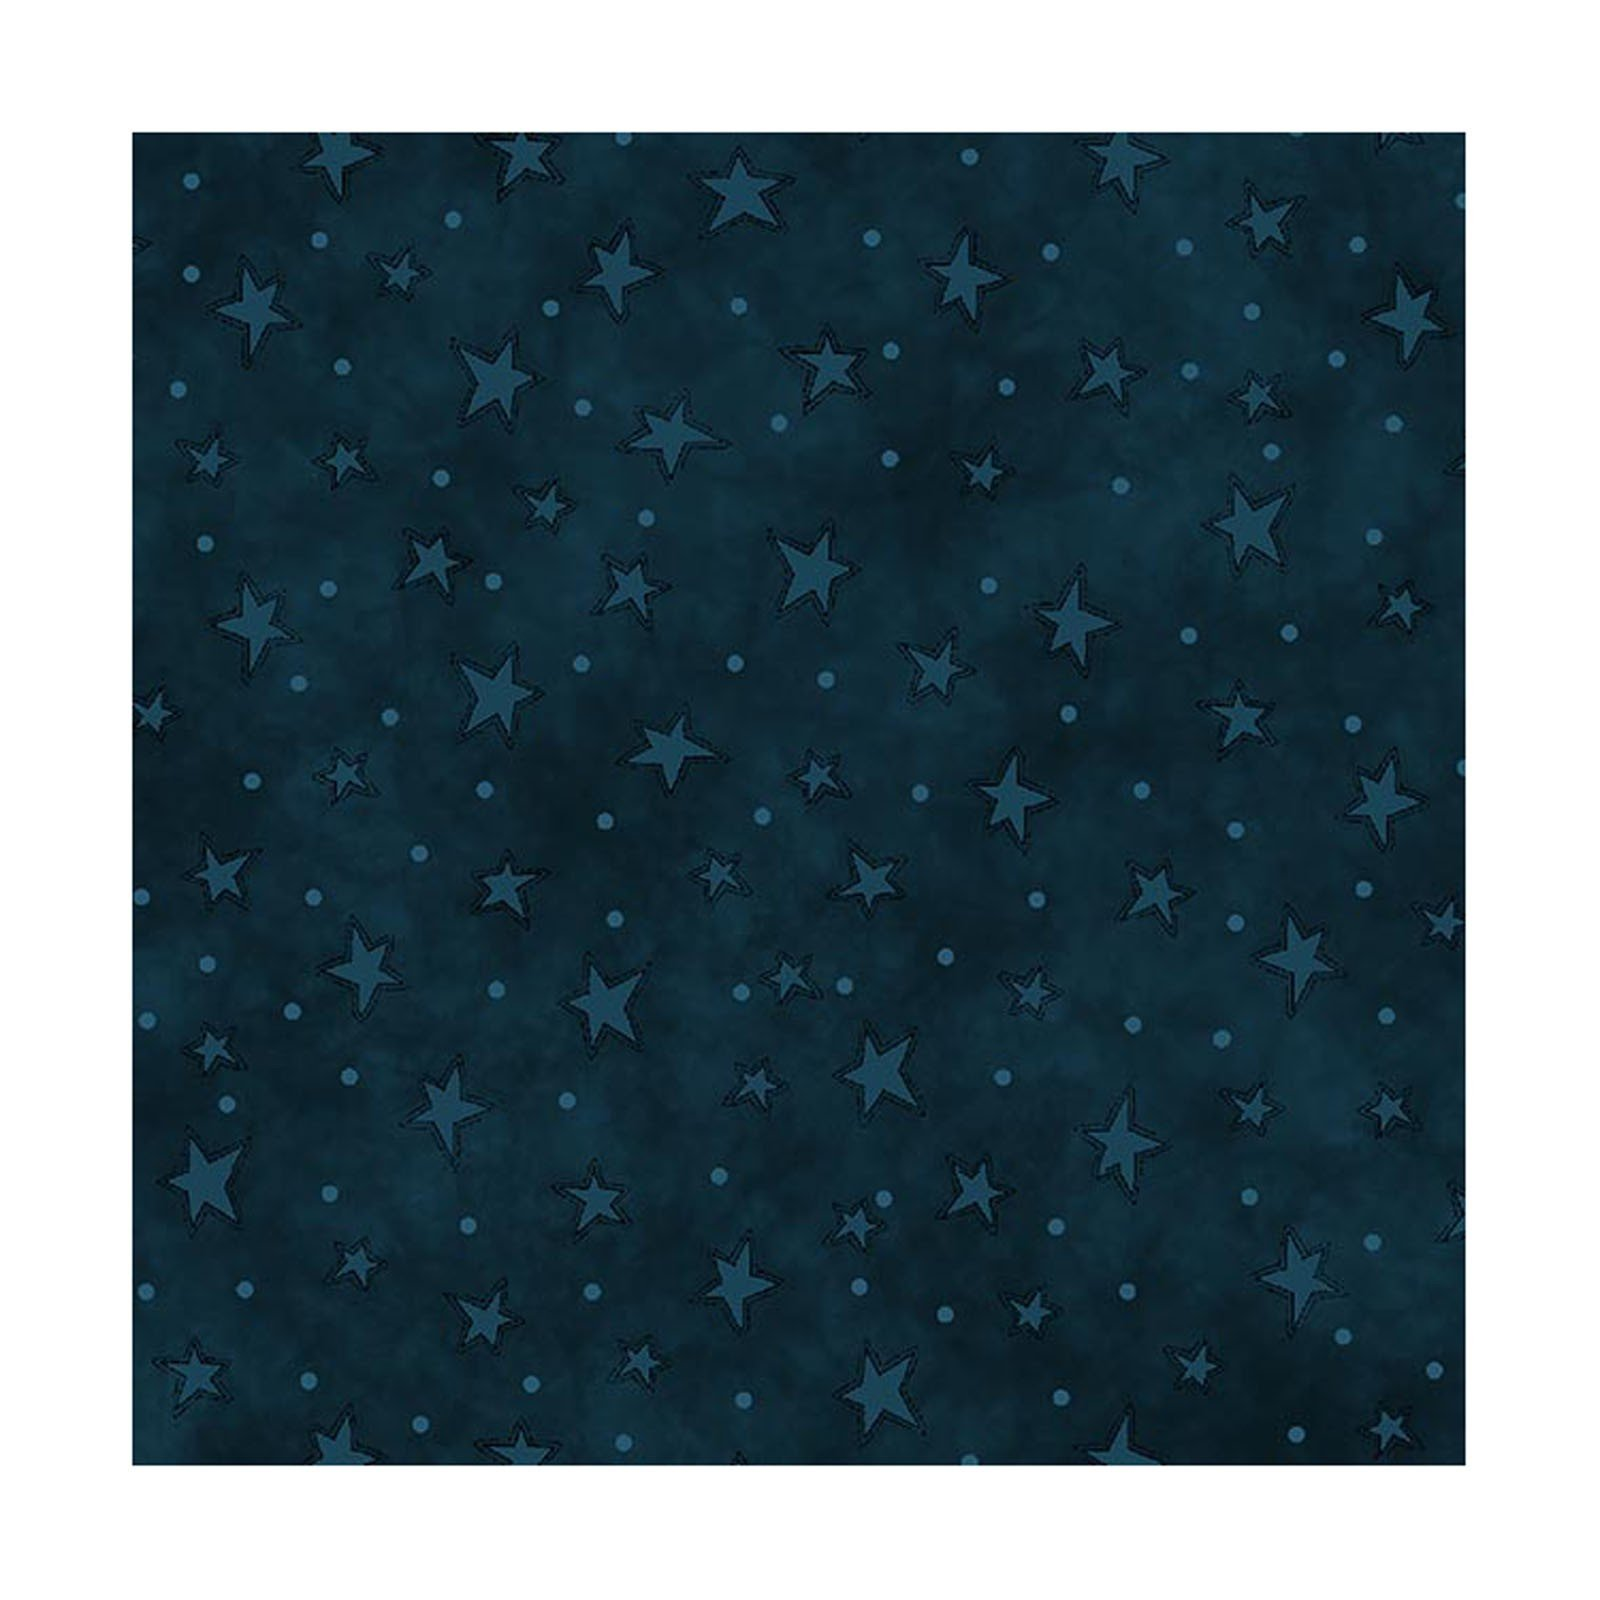 Starry Basics - Blue Stars